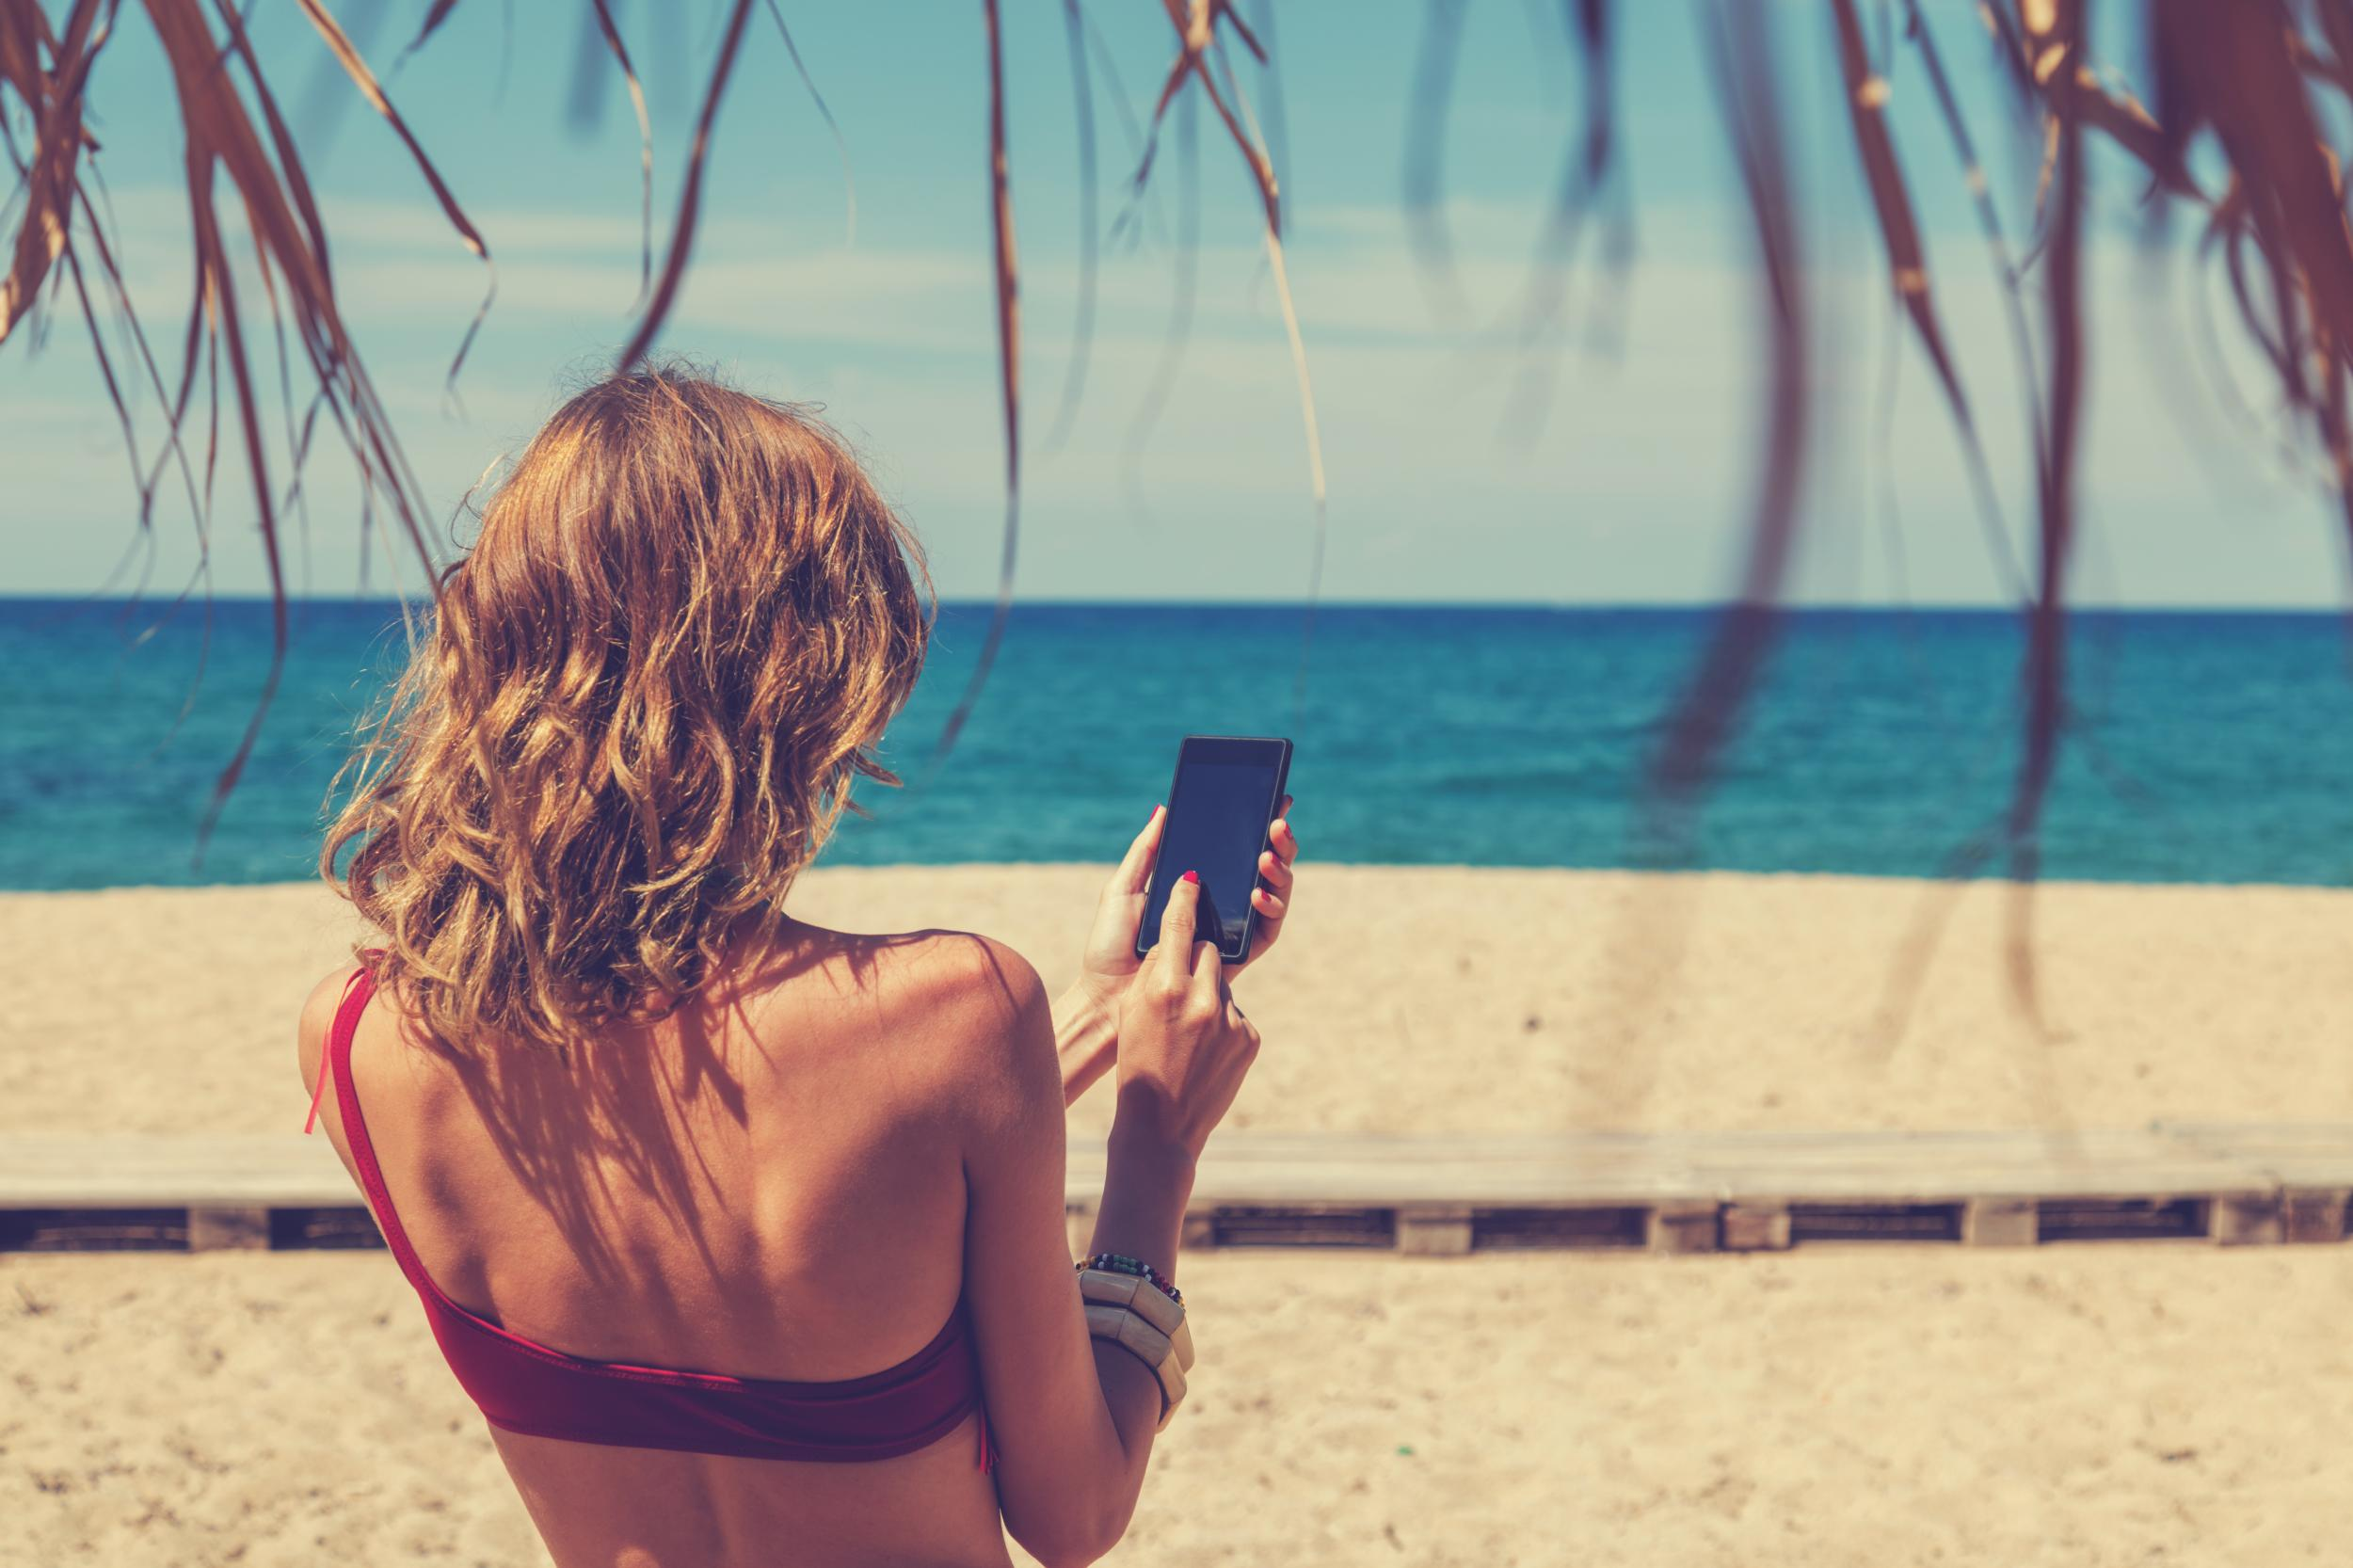 Instagram: Users can now book holidays through social media platform ...